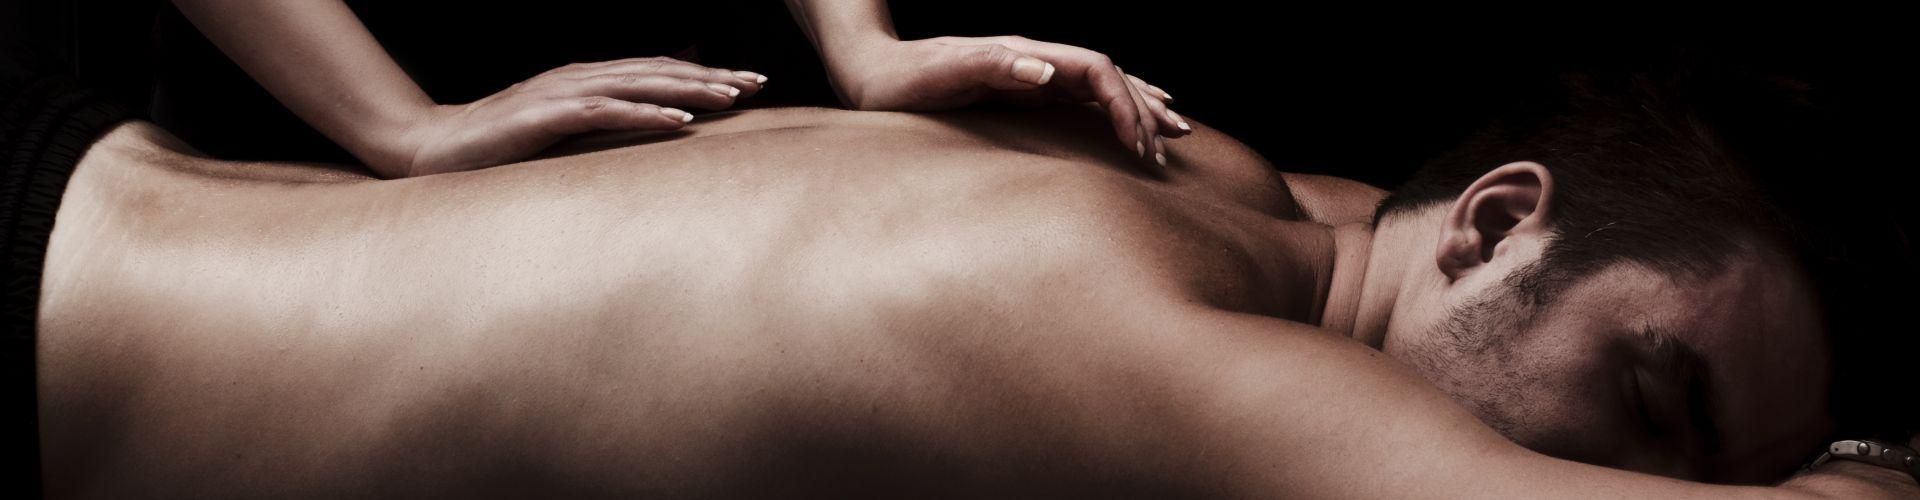 Relaxačno-zmyselná masáž